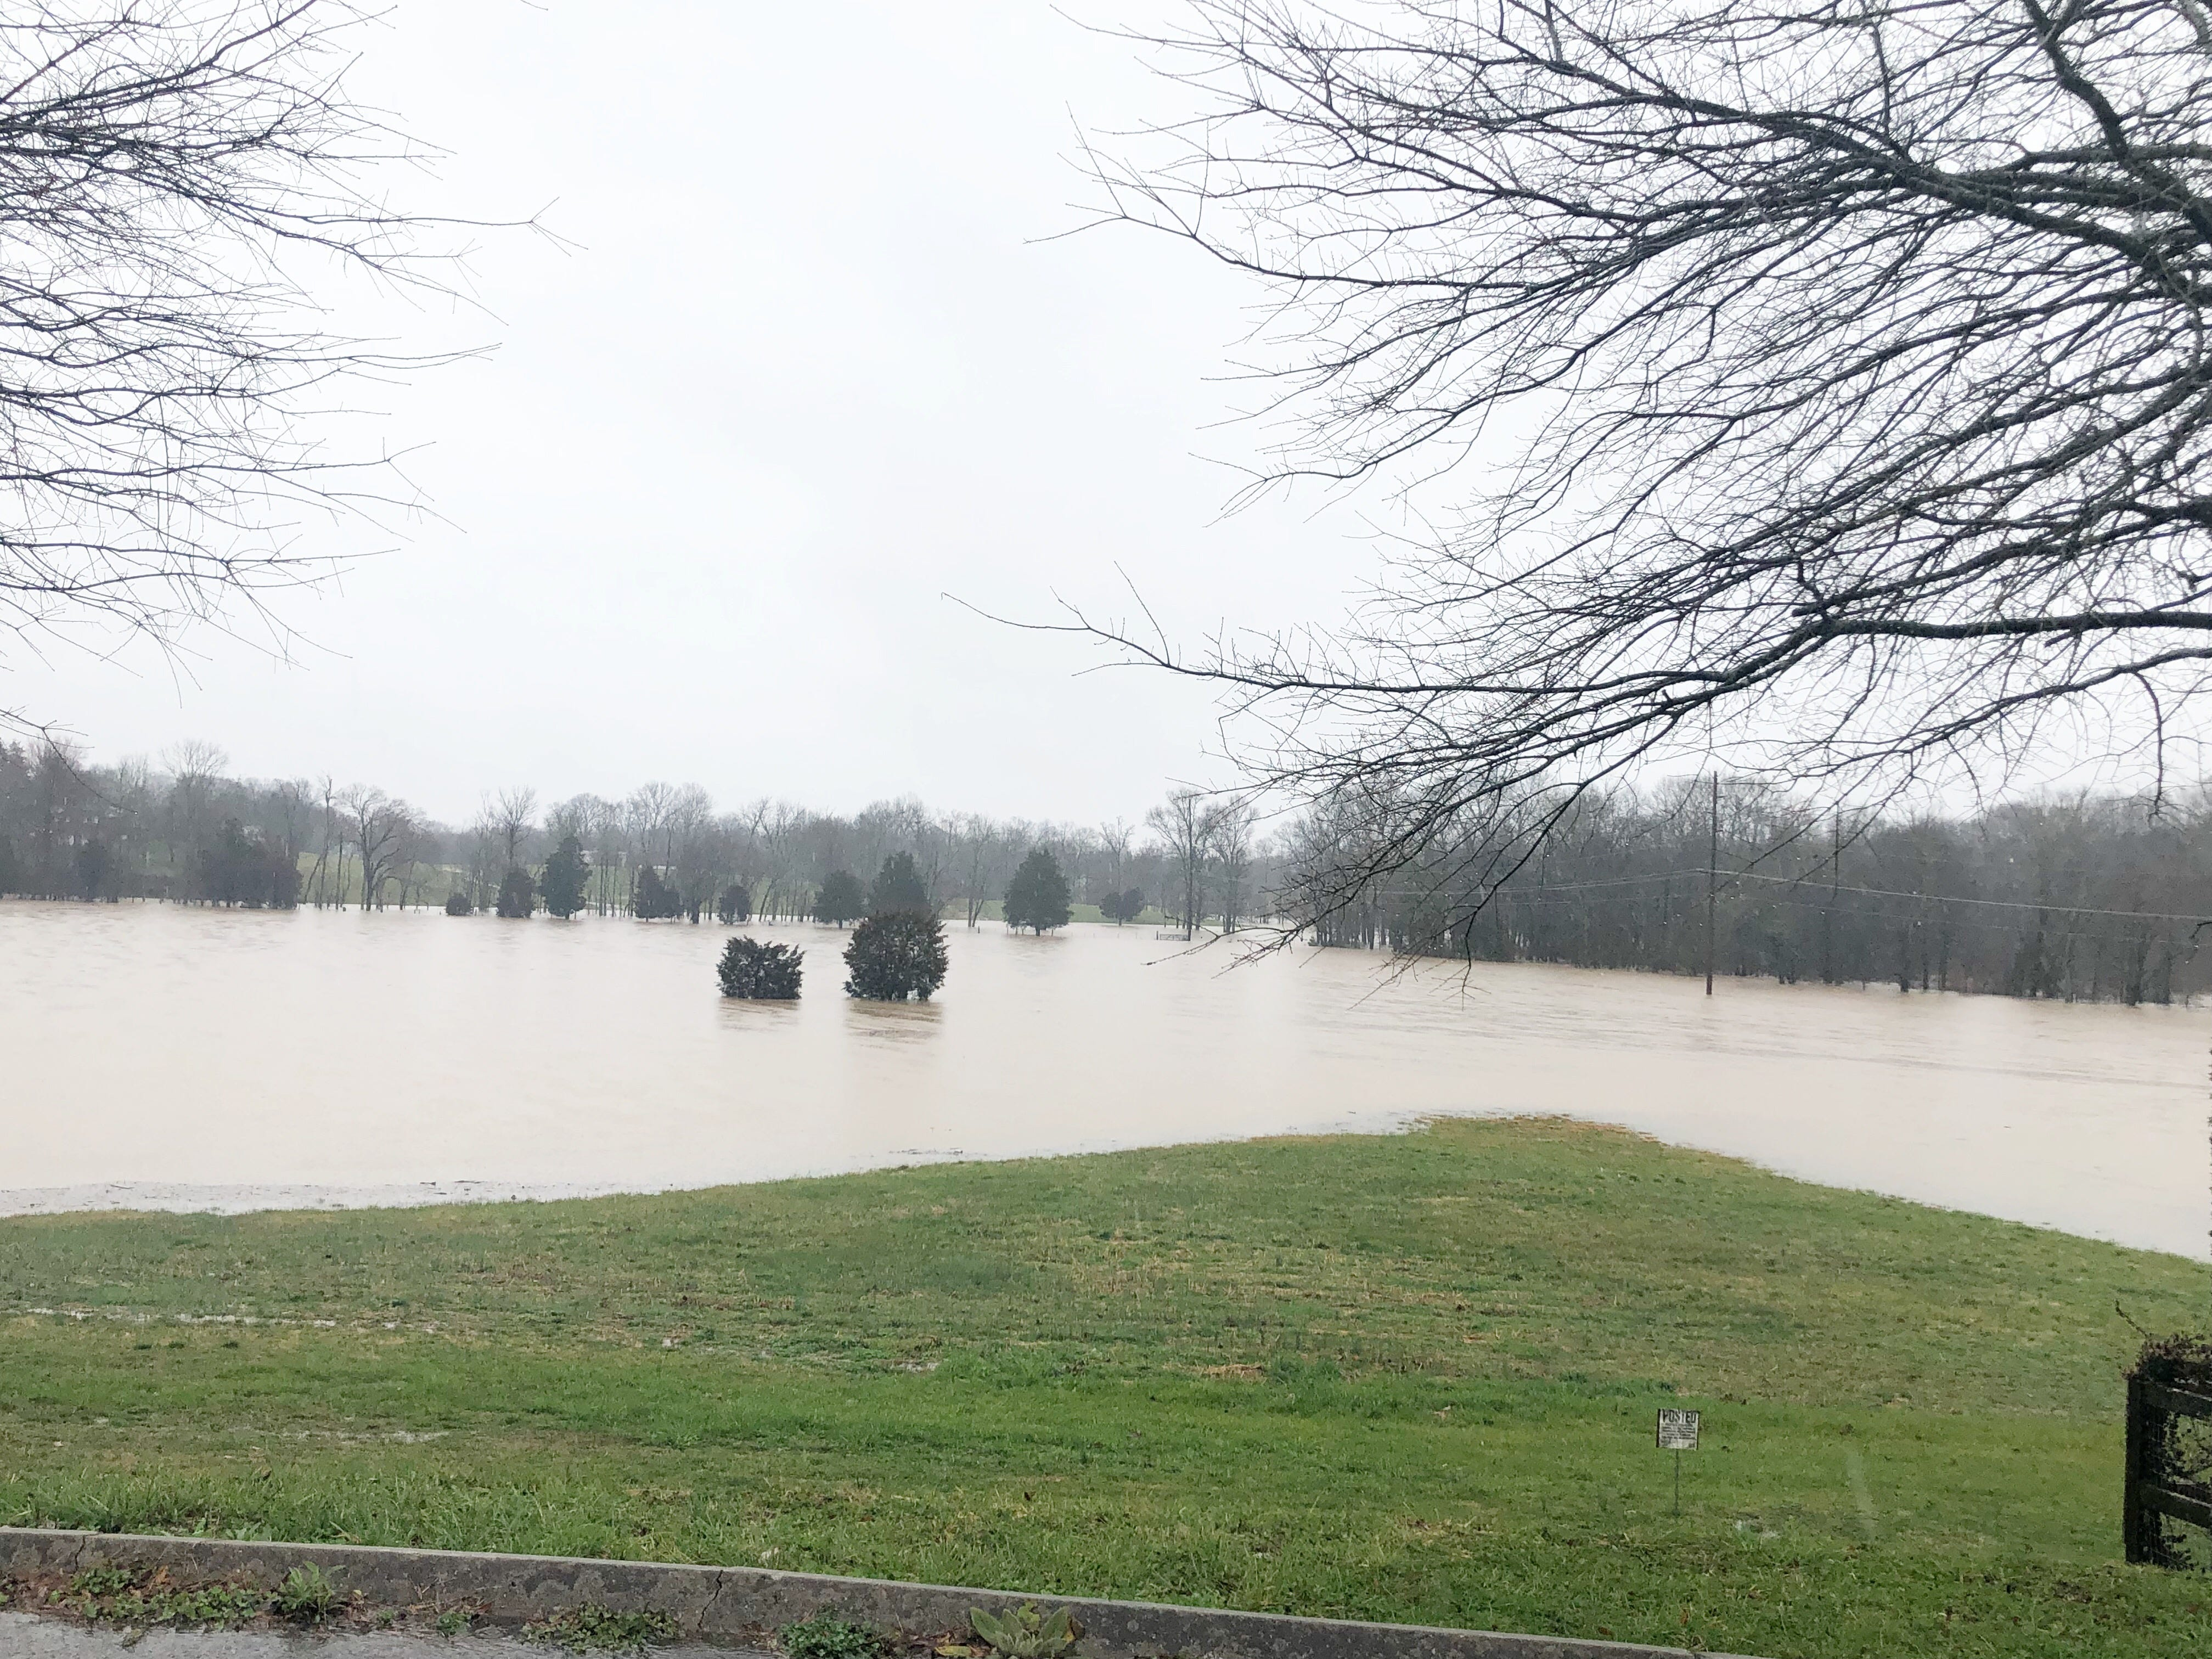 Flooding from Beaver Creek near Brickey McCloud Elementary School in Halls on Saturday, Feb. 23, 2019.